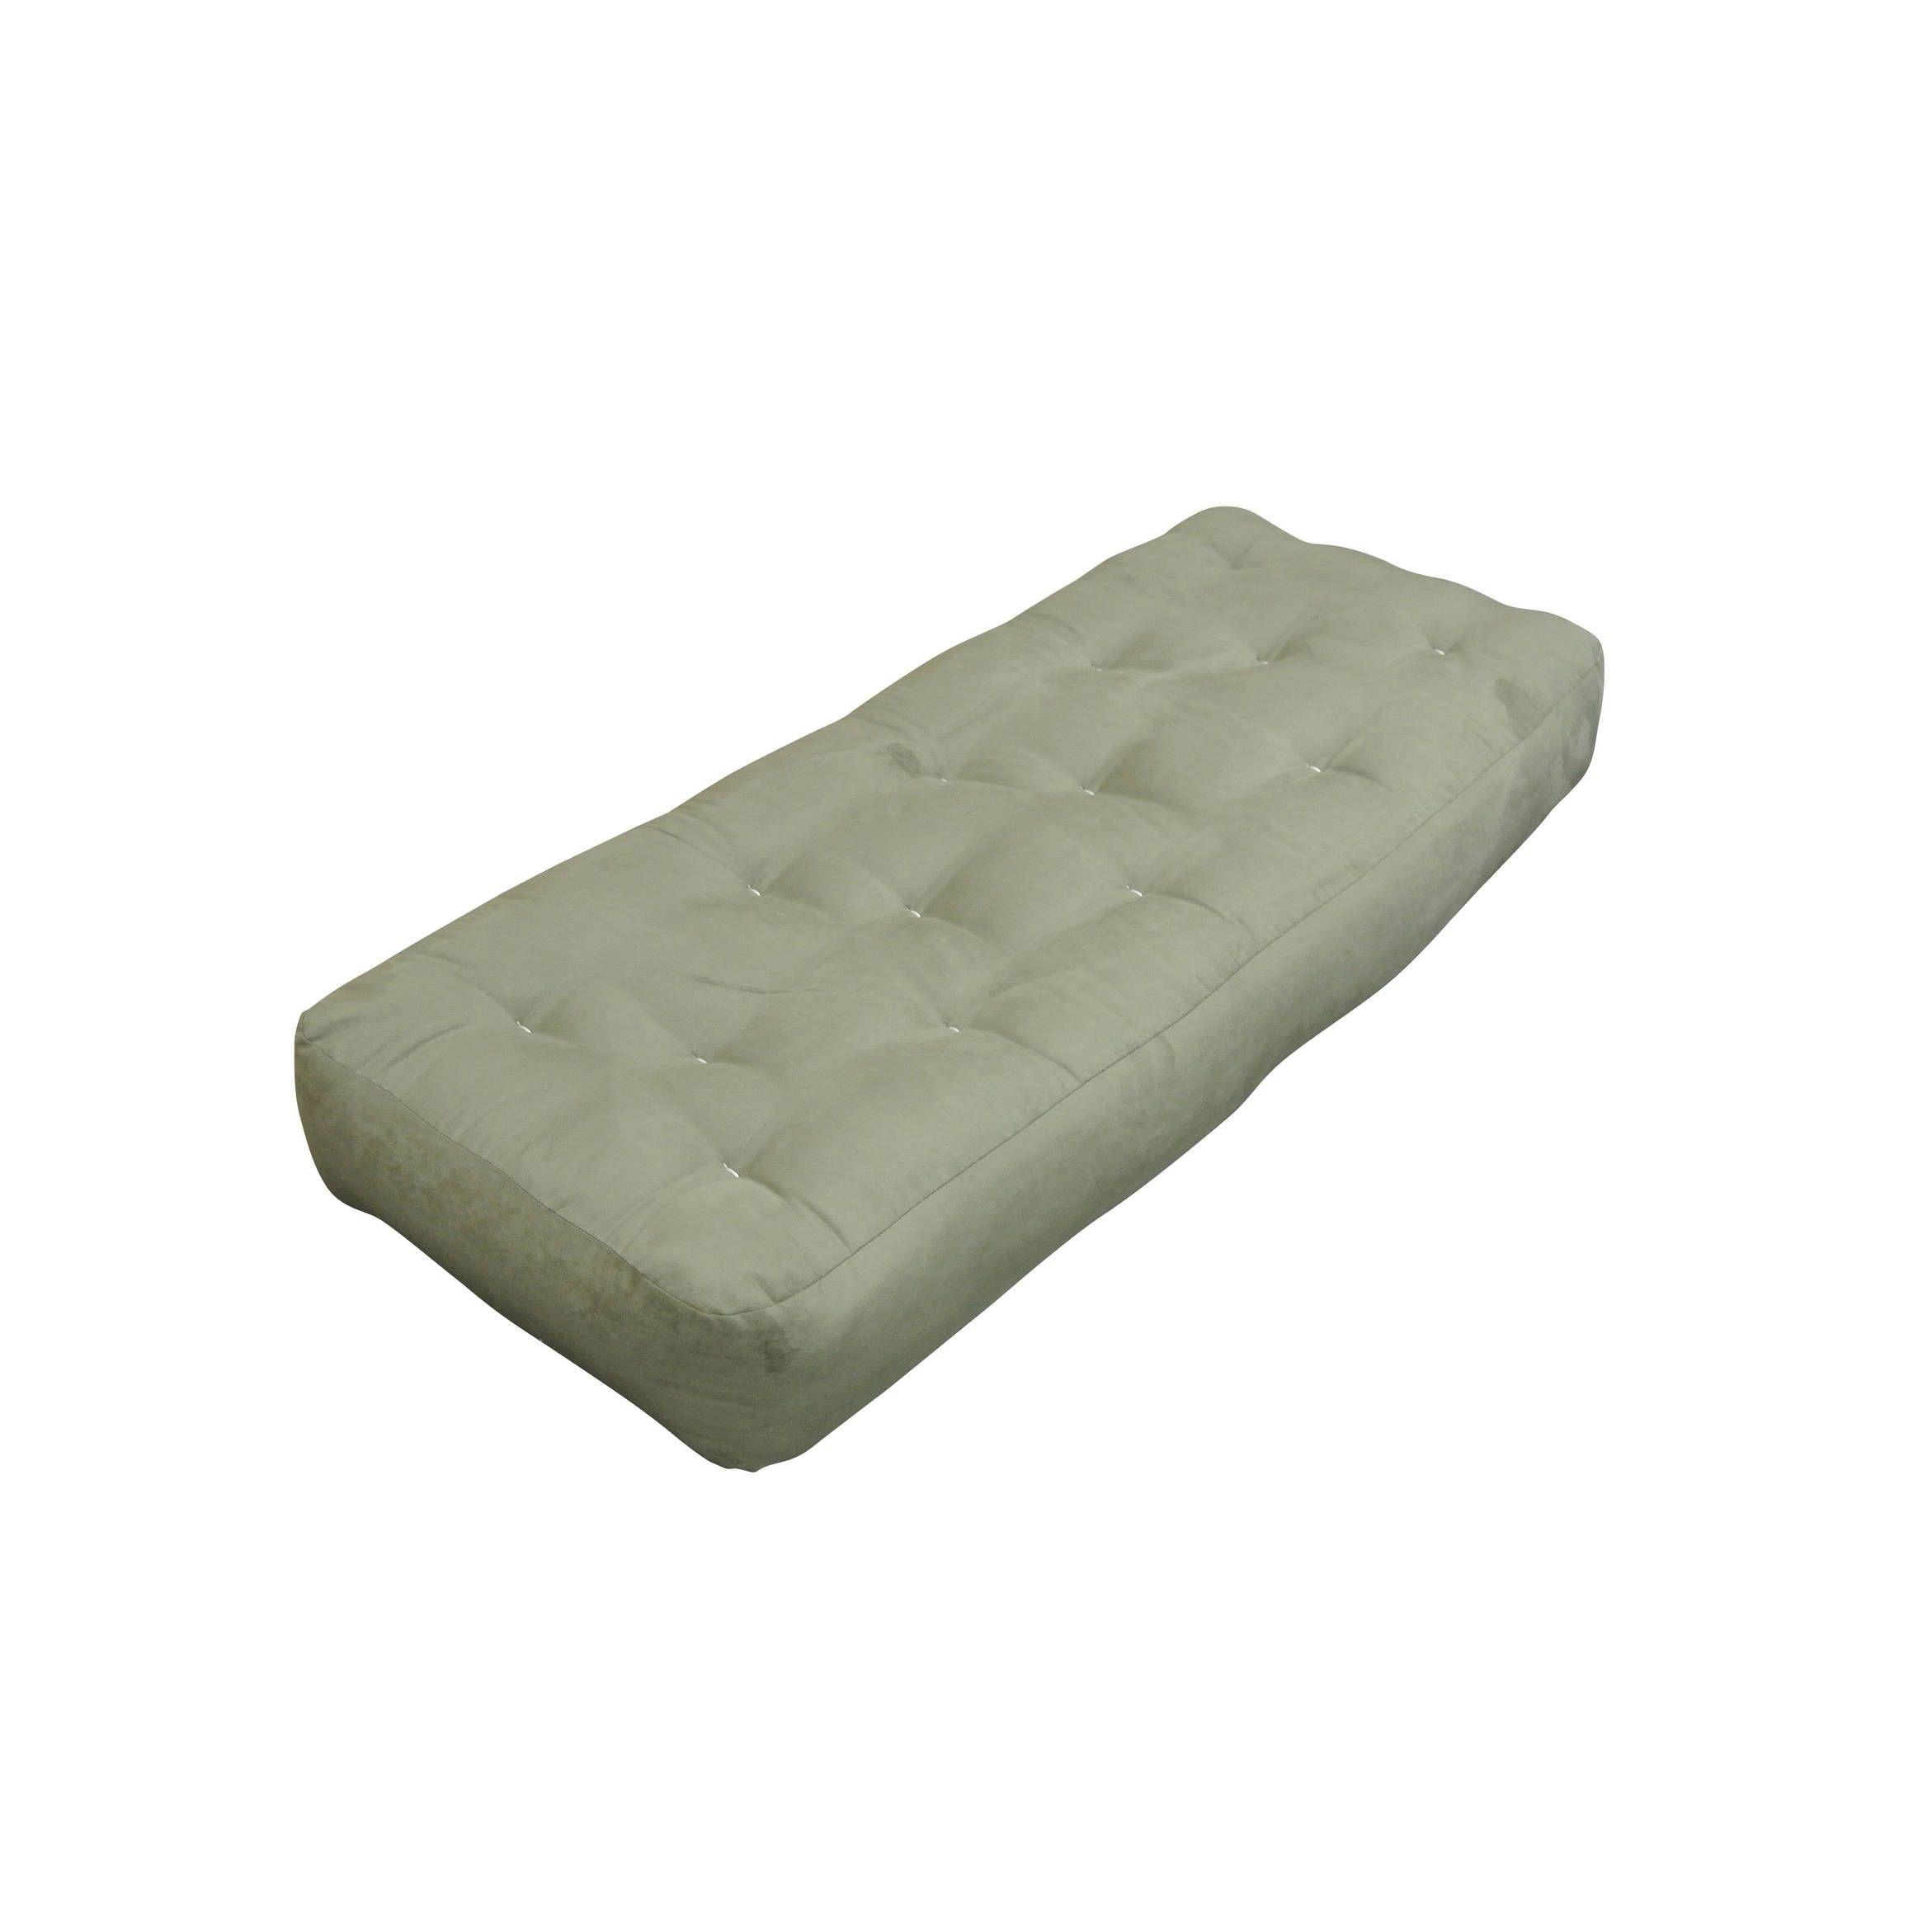 Feathertouch Ii Sage Microfiber 9 Inch Loveseat Ottoman Size Futon Mattress Green